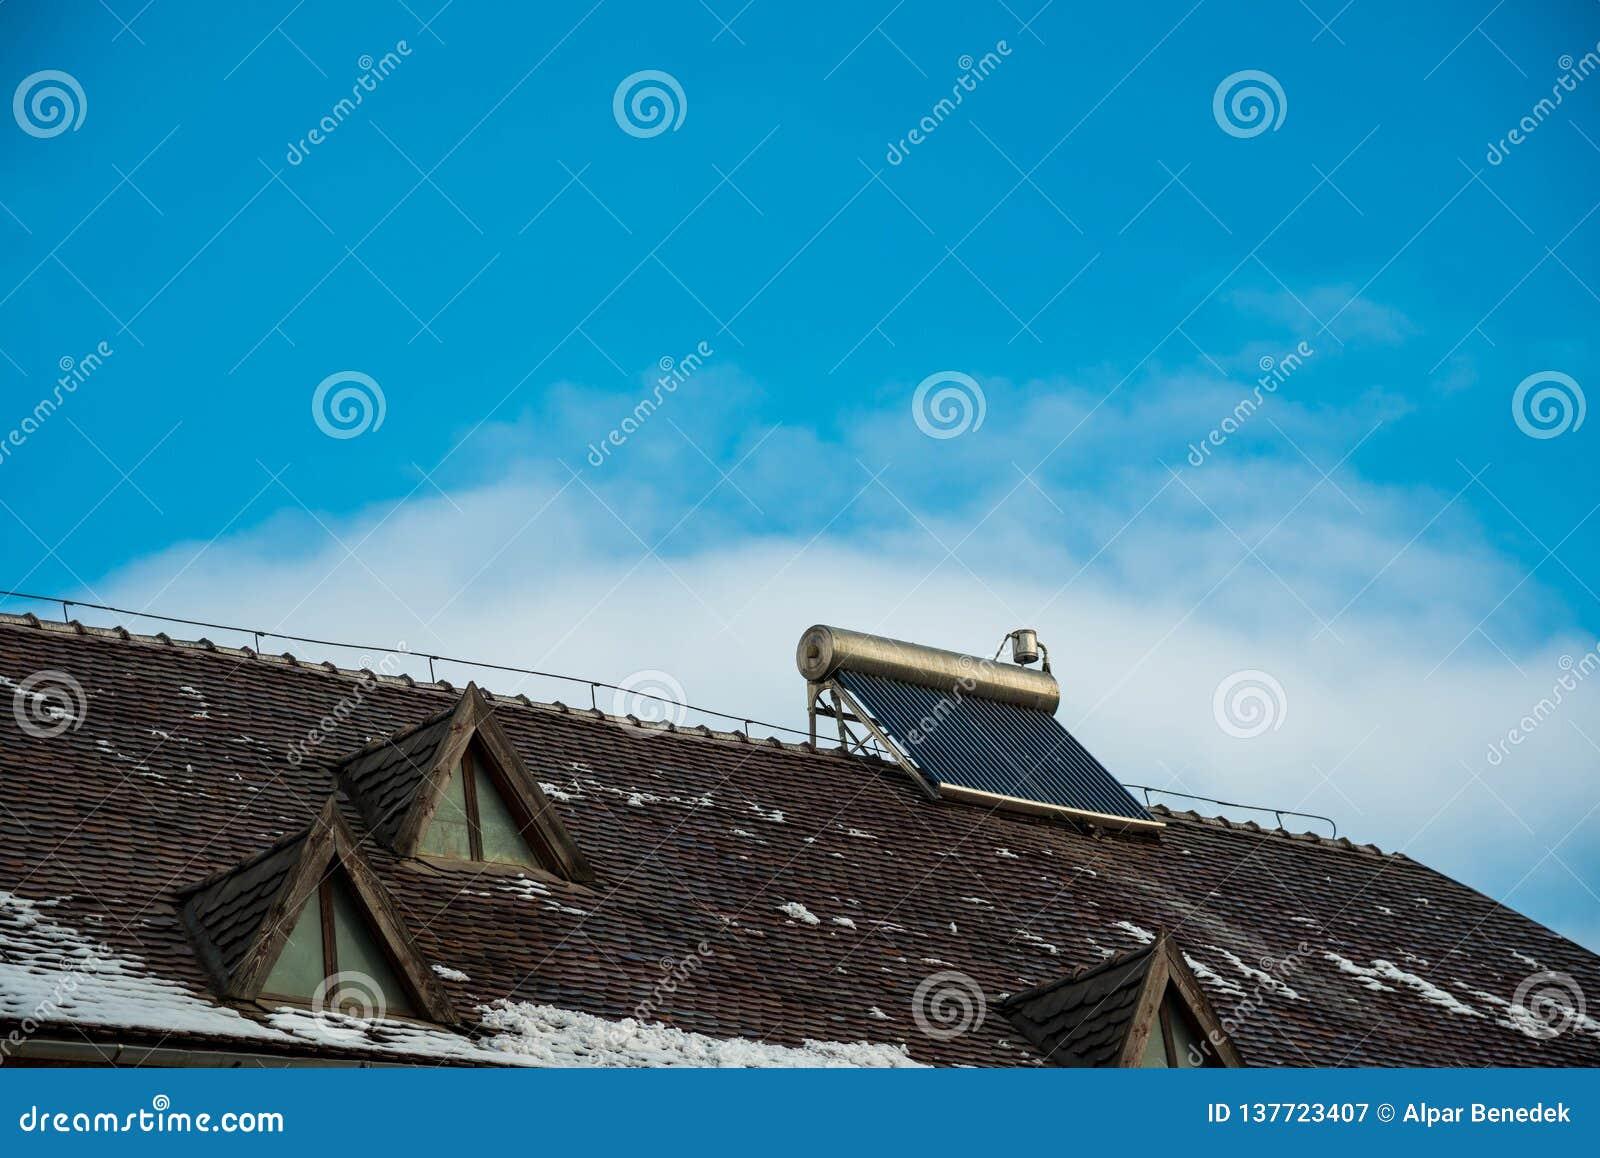 Solar water heater boiler on old buildings rooftop